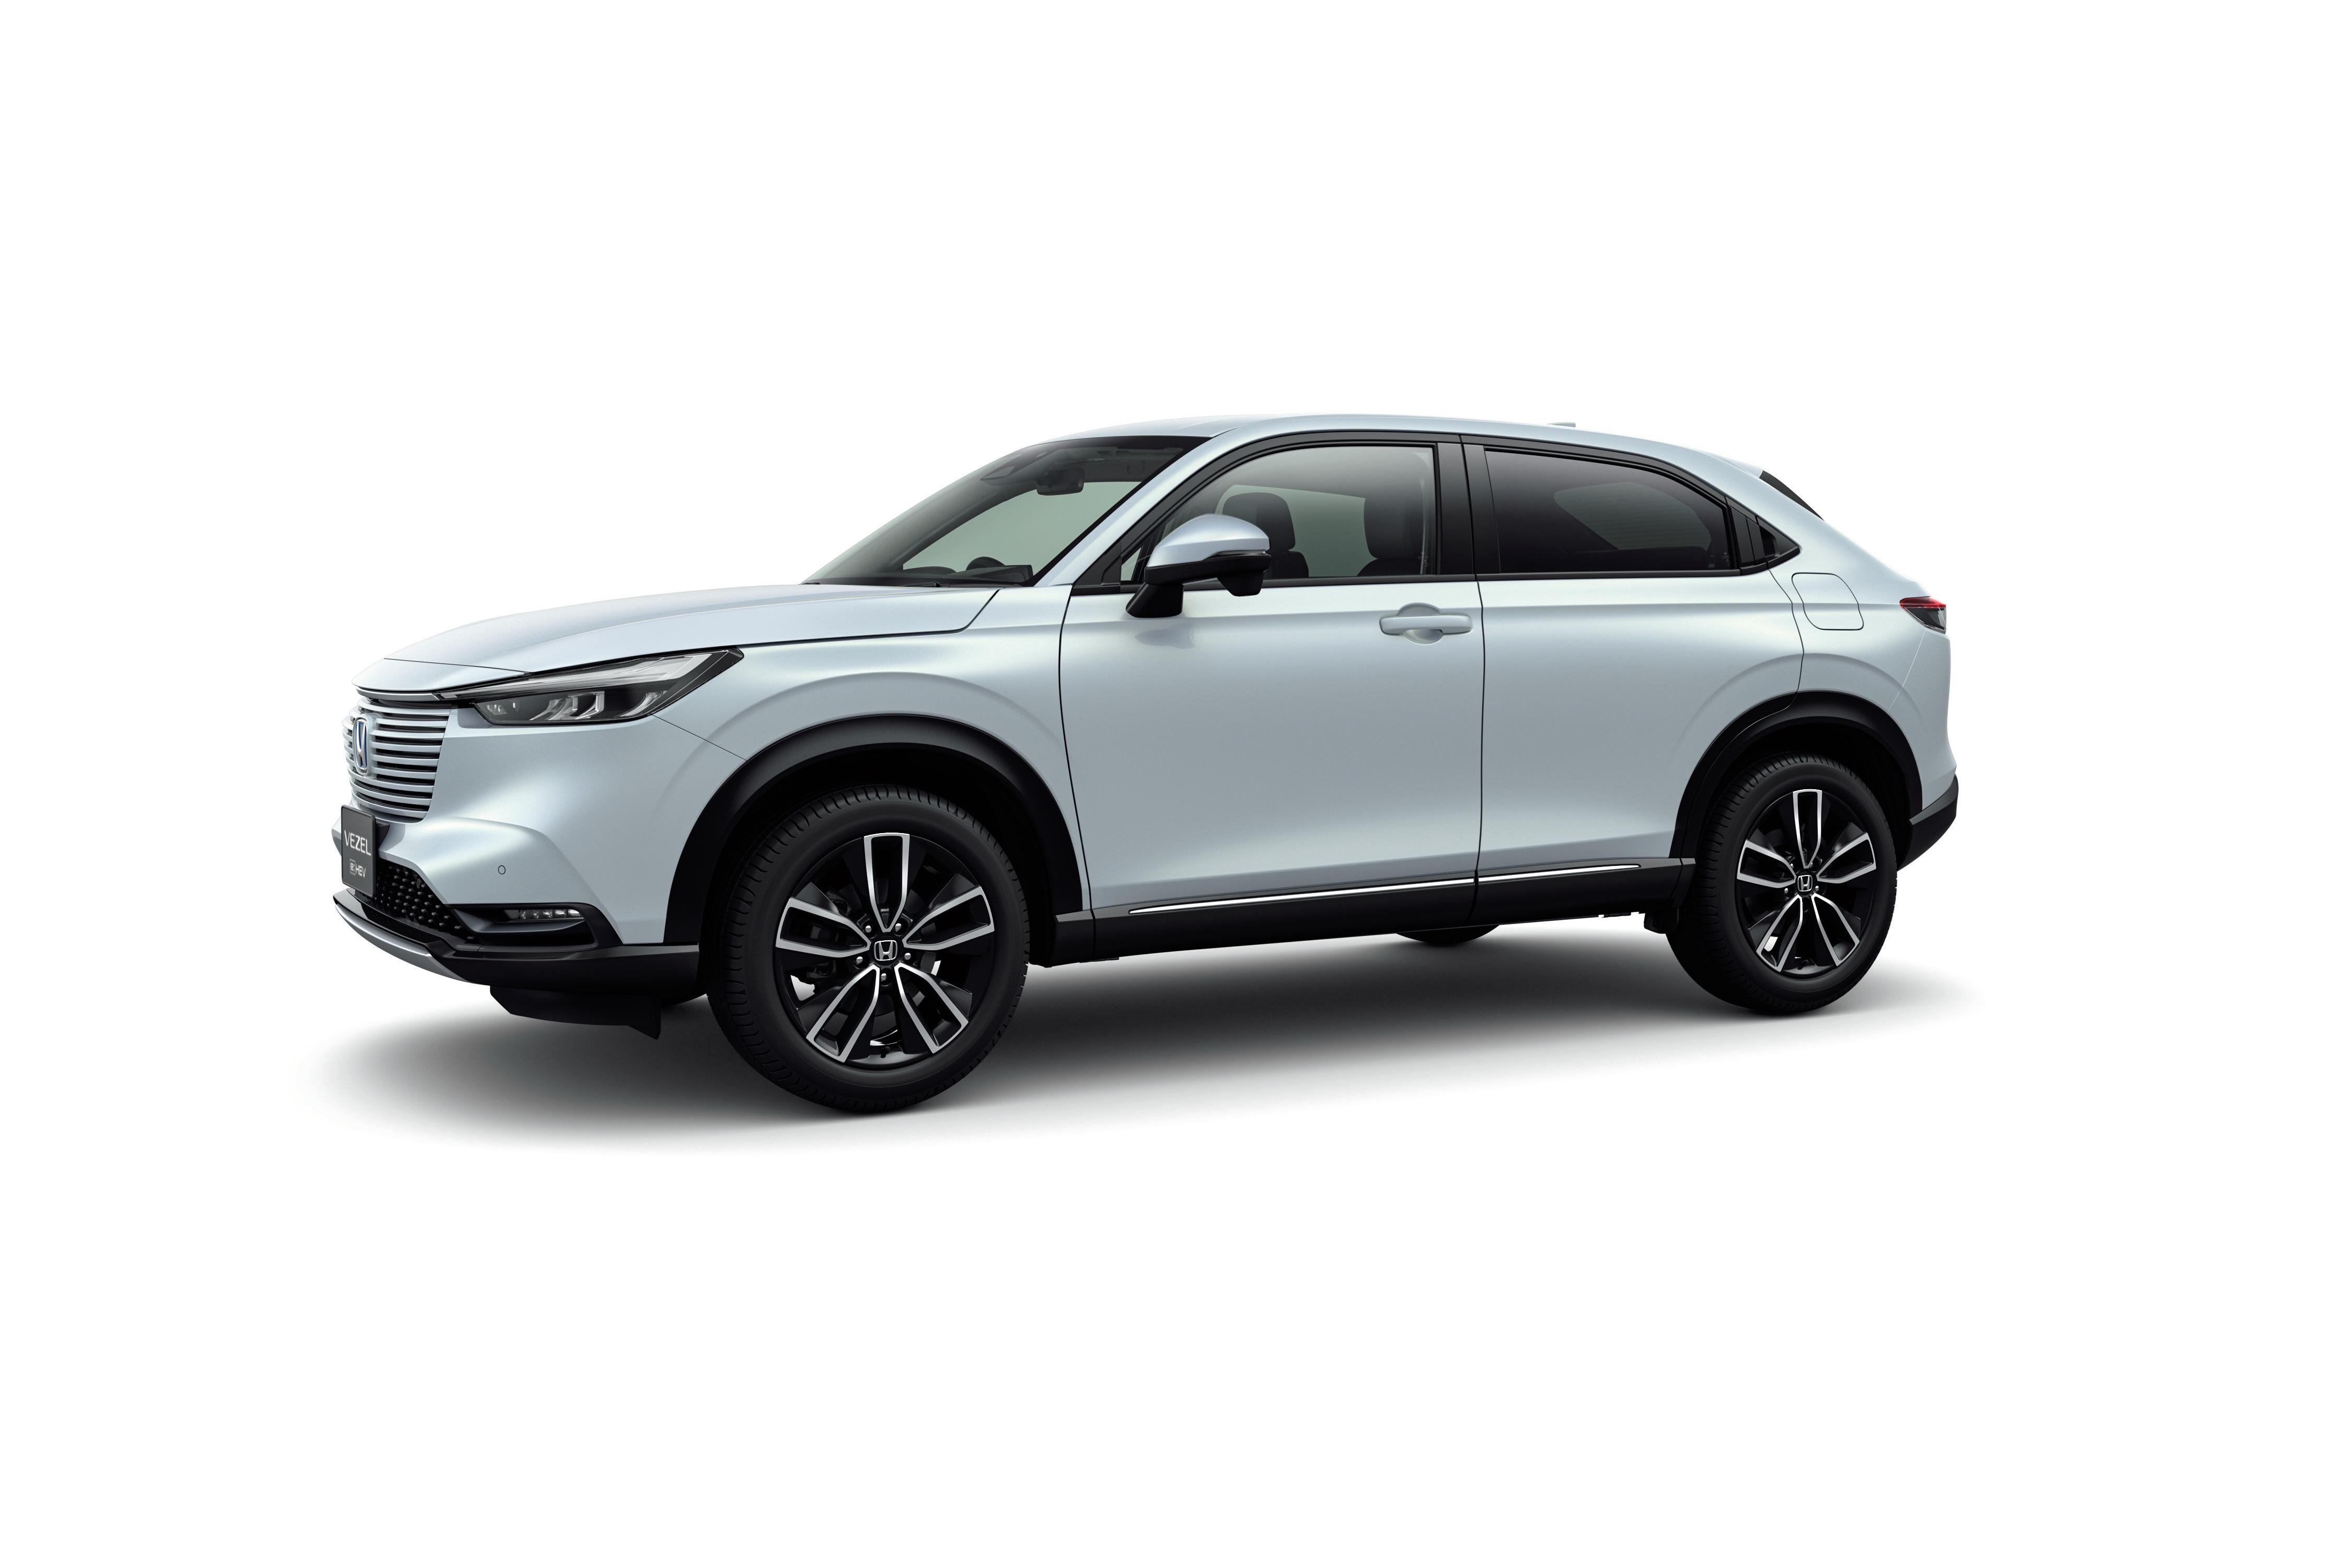 Image Honda Crossover Vezel e:HEV, JP-spec, 2021 Hybrid vehicle White Metallic automobile White background 4500x3000 CUV Cars auto